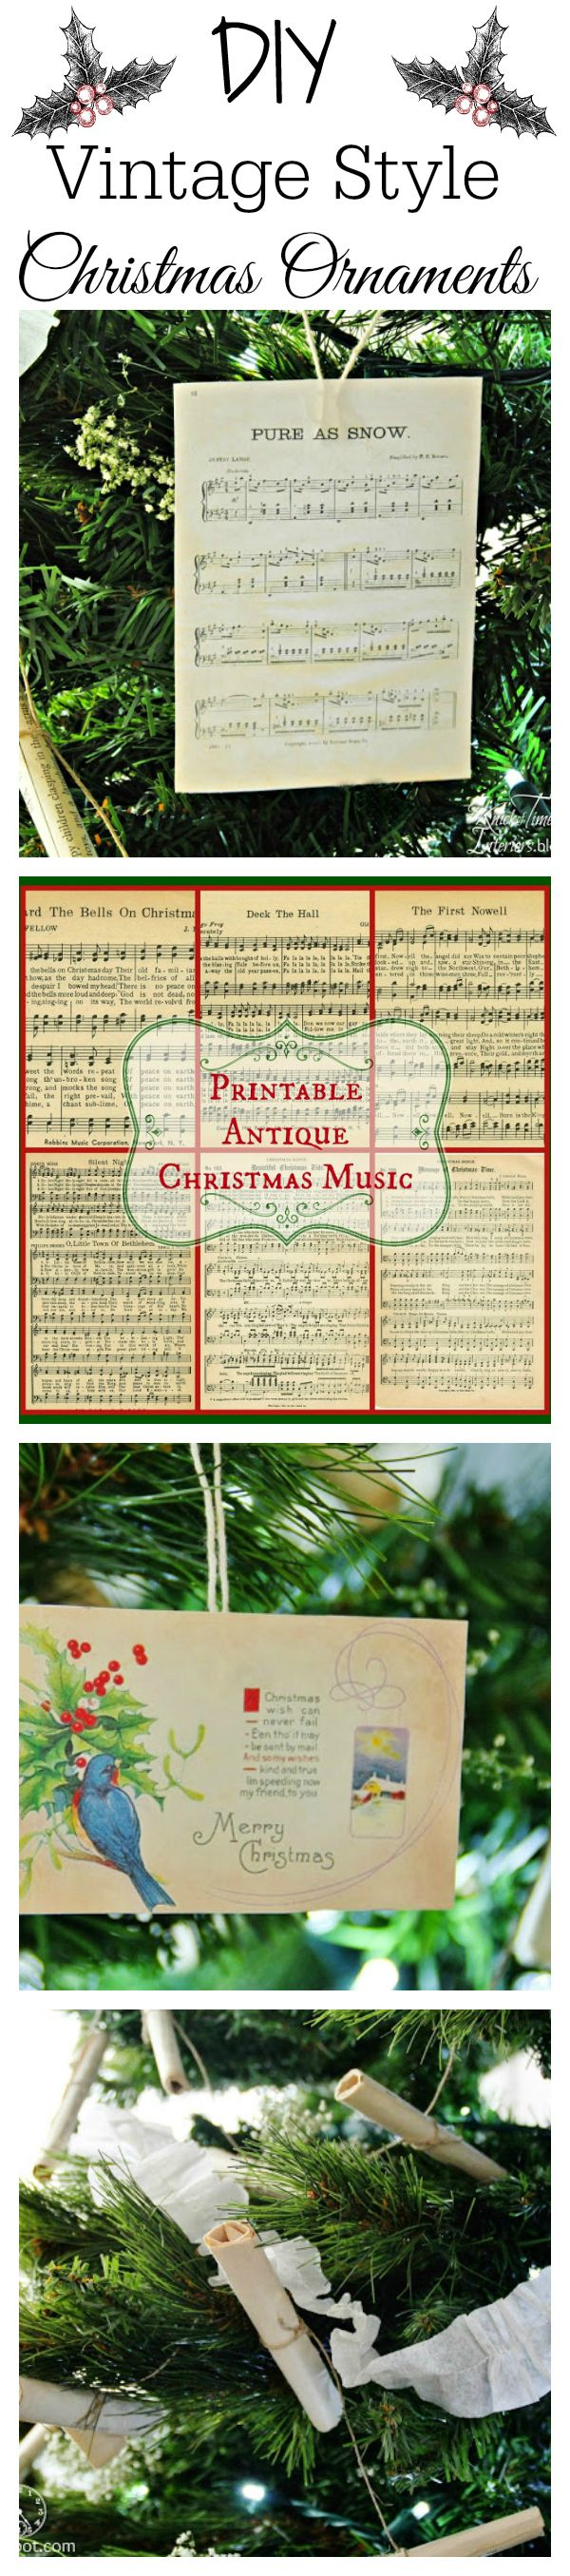 Christmas Tree Vintage Style 1153 best Printables